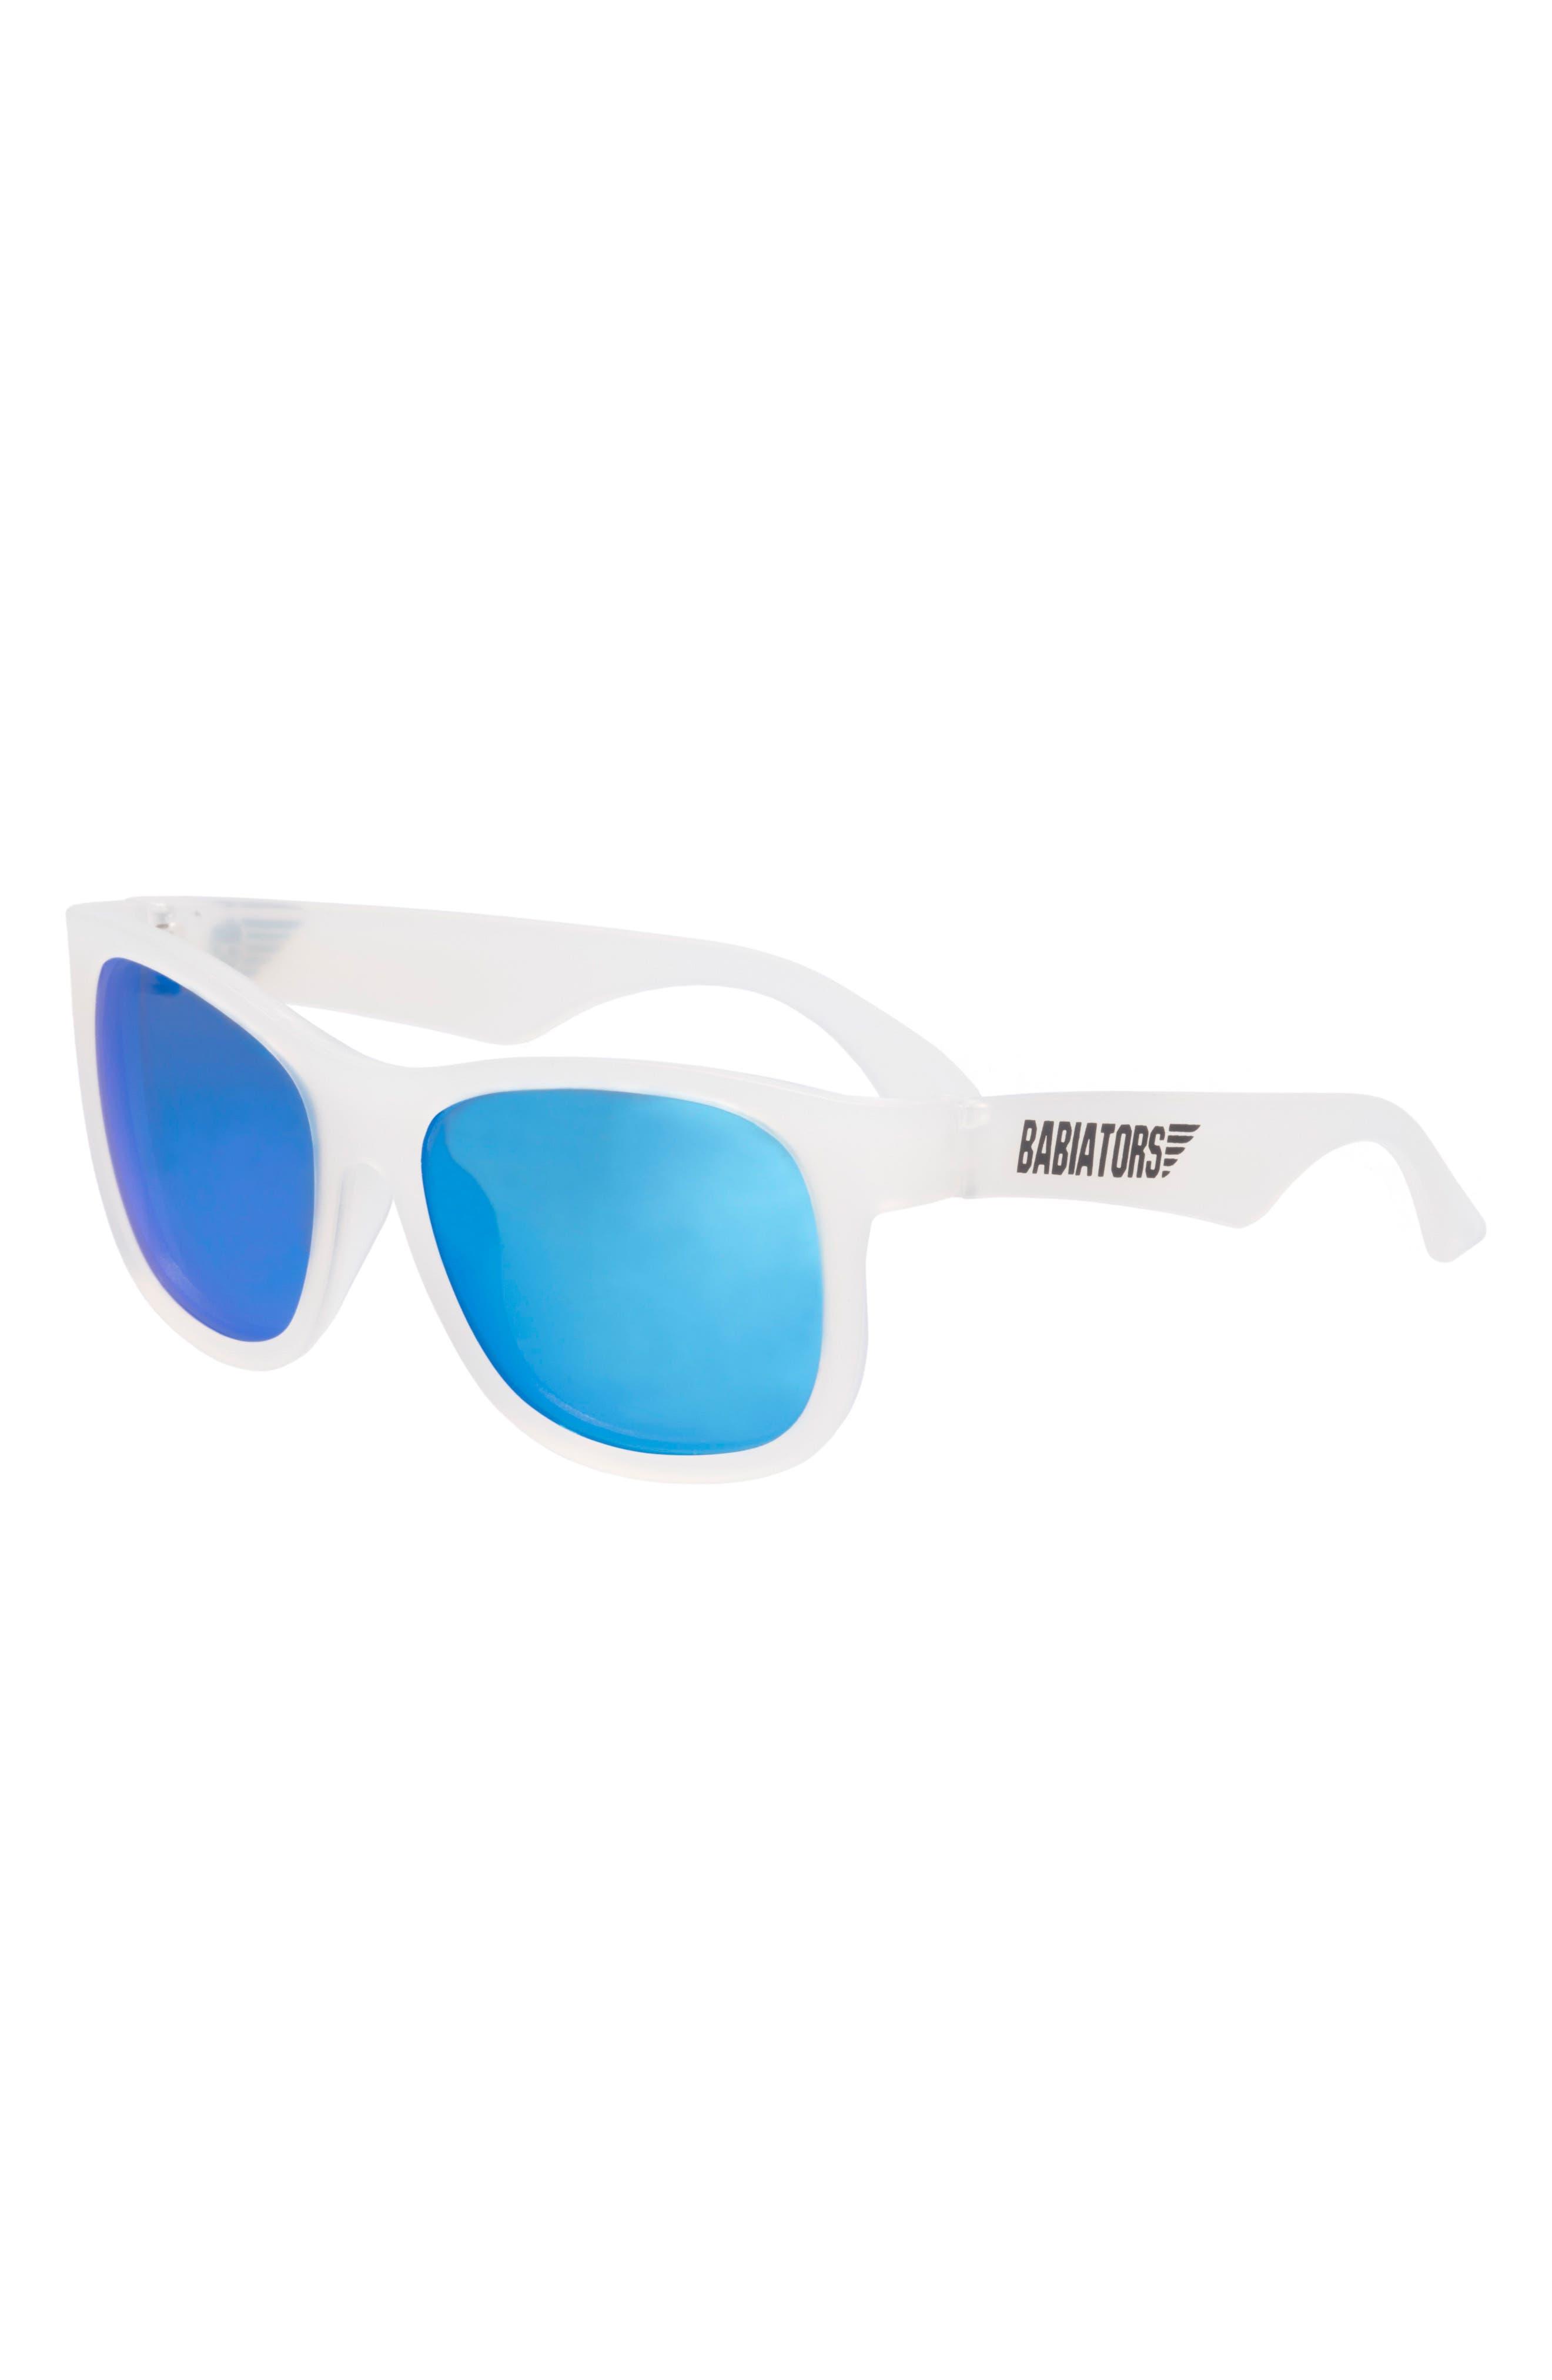 Original Navigator Sunglasses,                             Main thumbnail 1, color,                             BLUE ICE